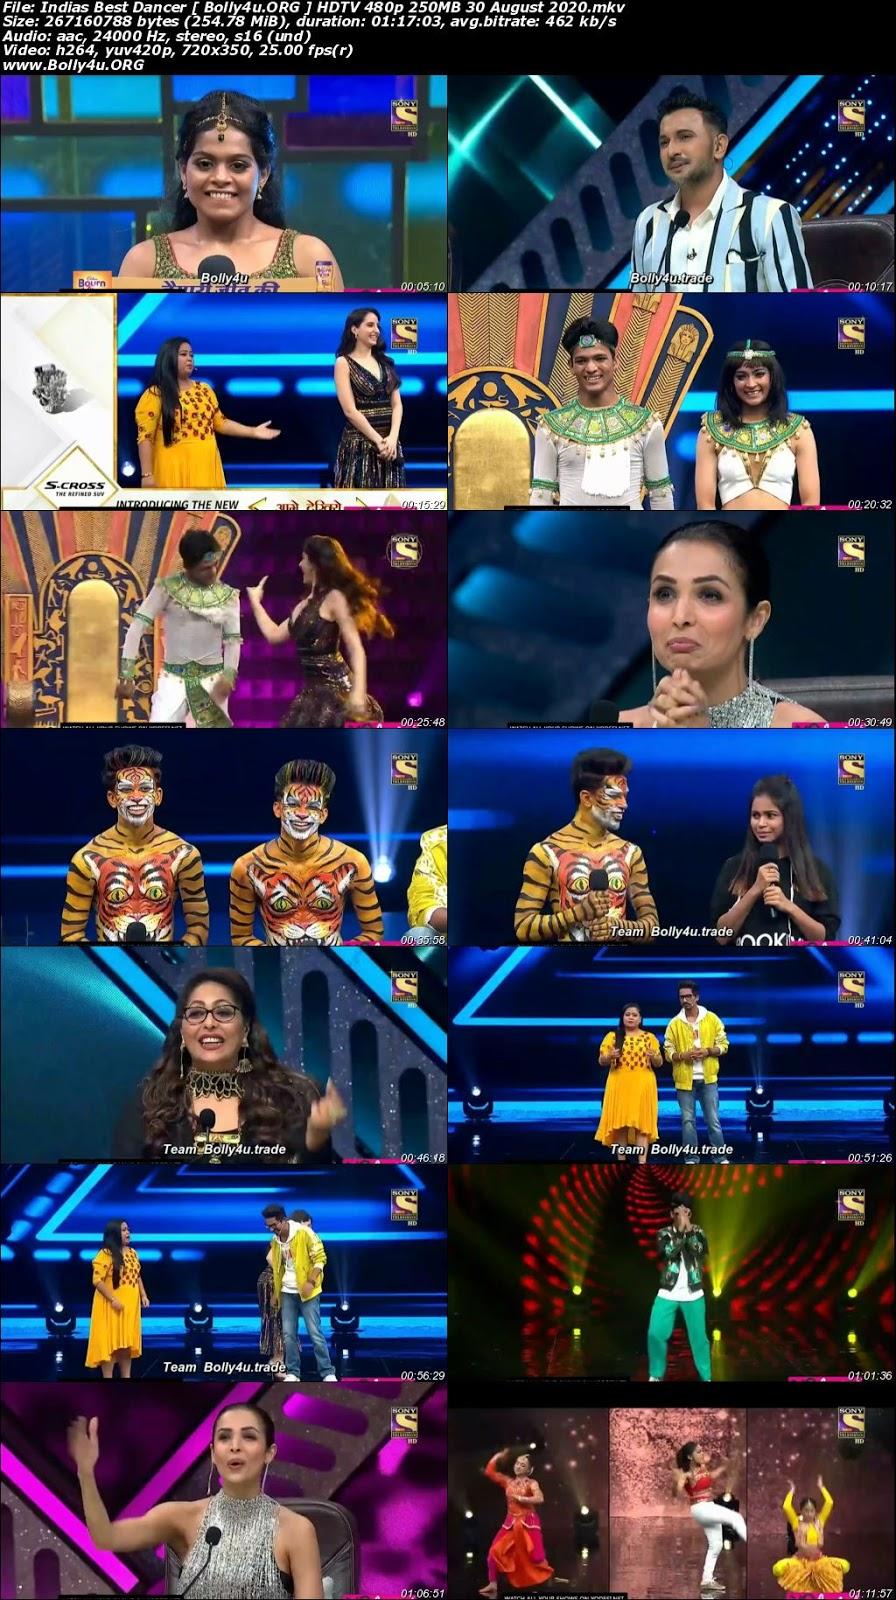 Indias Best Dancer HDTV 480p 250MB 30 August 2020 Download